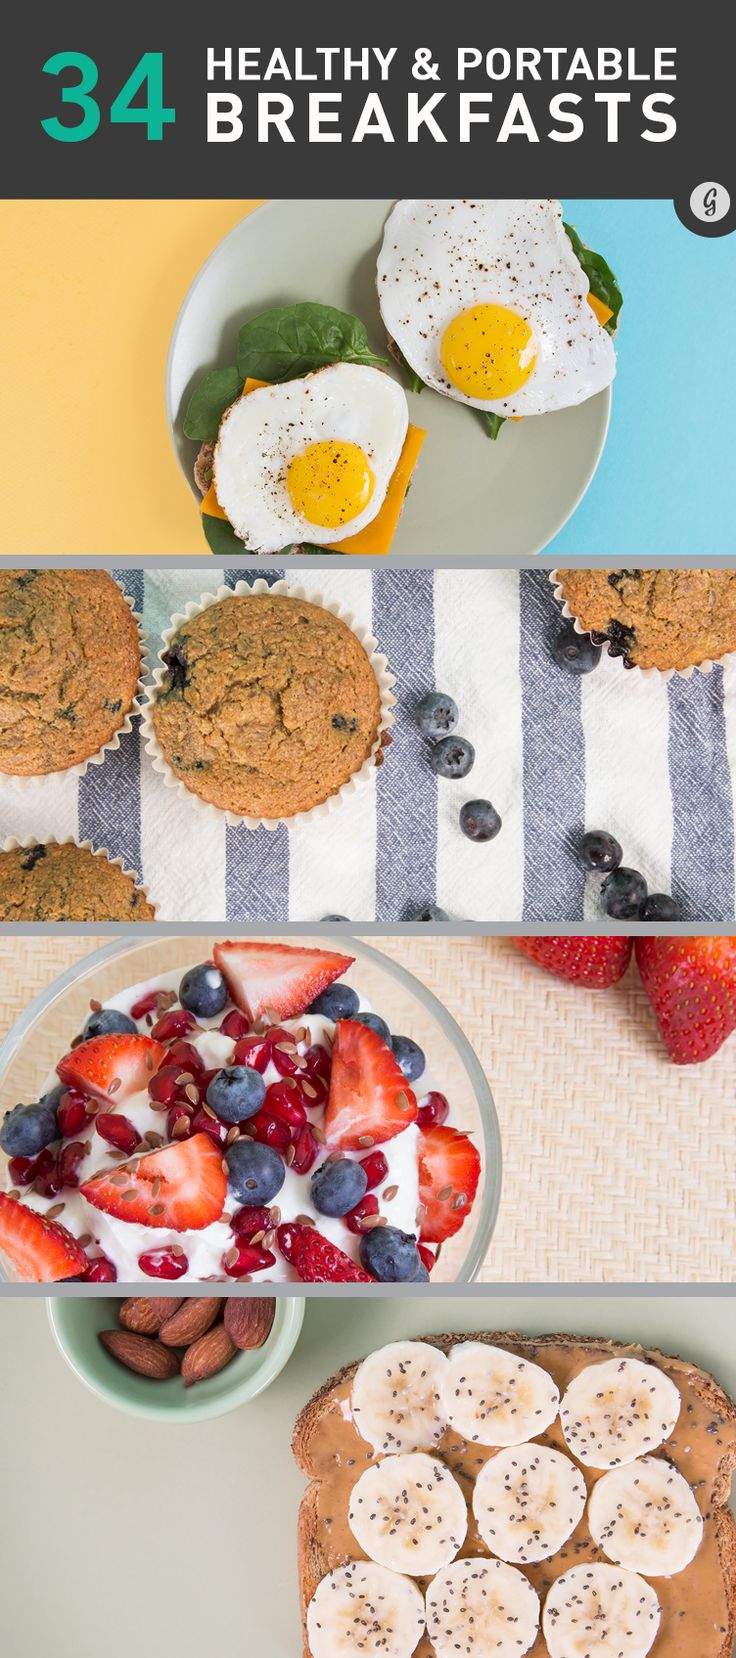 34 Healthy Breakfasts for Busy Mornings Dr. Scott Arneson (952) 562-2420 www.facebook.com/ScottArnesonDC